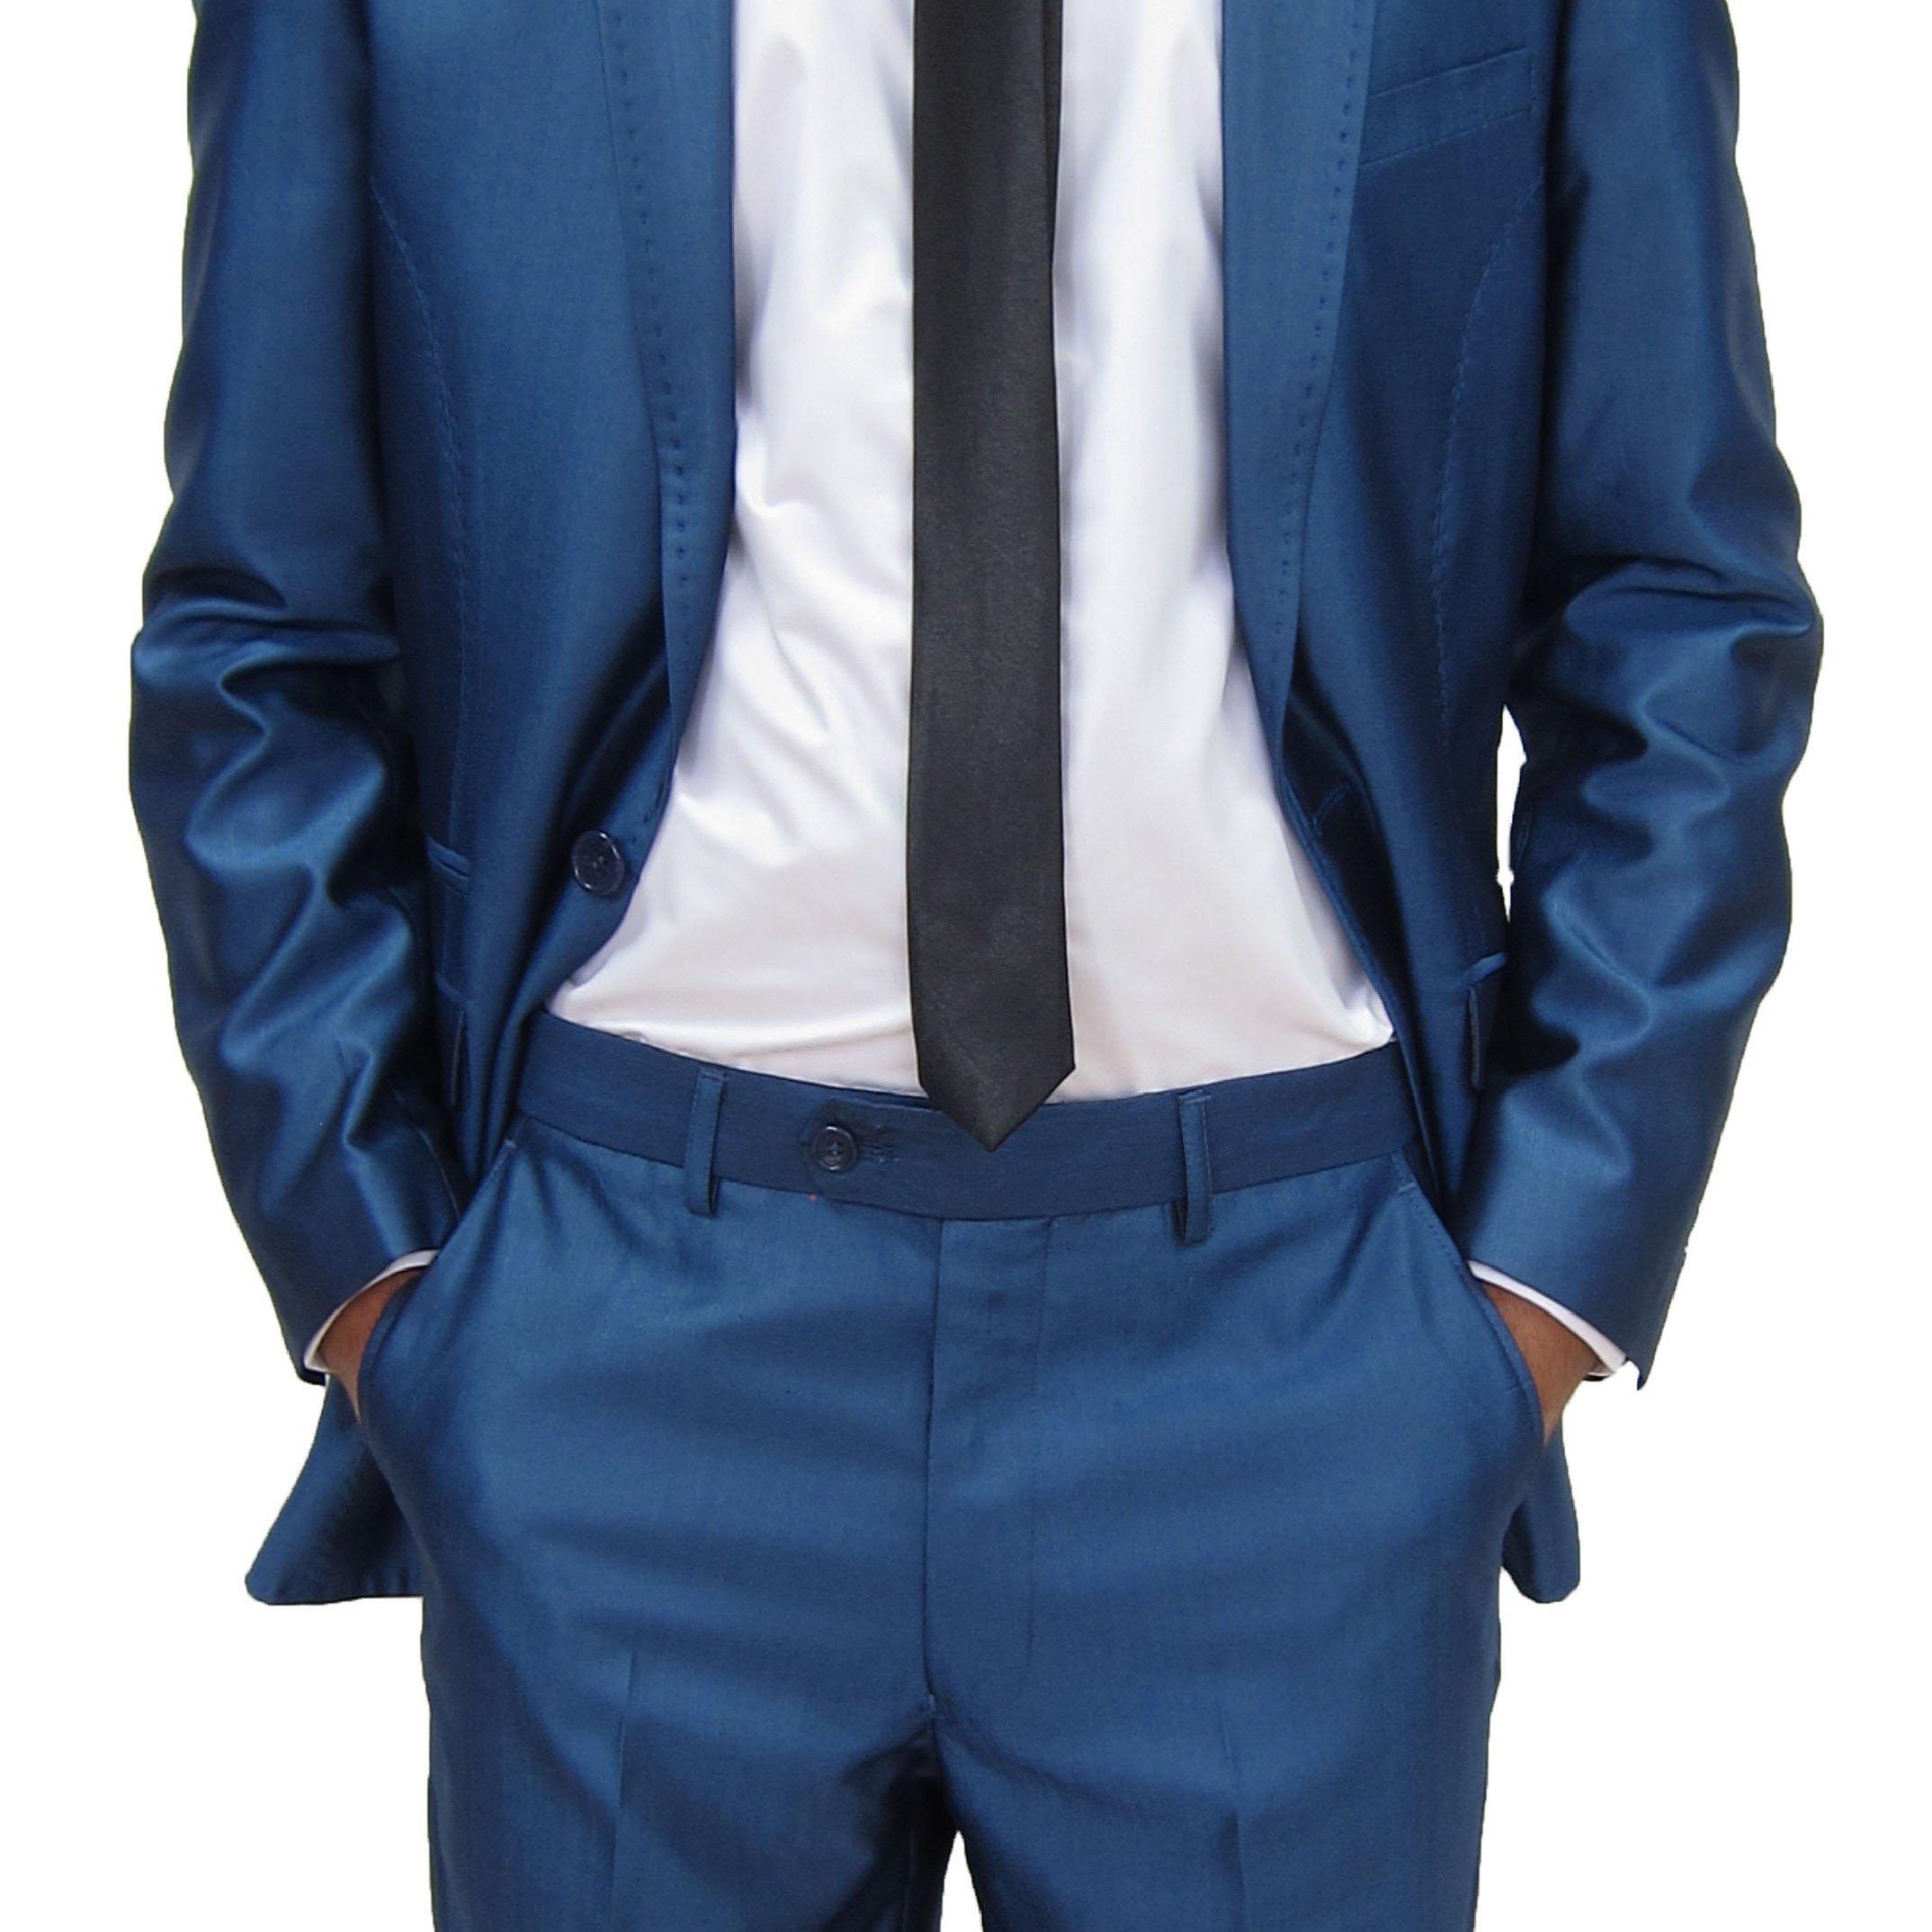 Plavo odelo #322 - frakovi - odela - smokinzi - smoking - muski-odelo-odela-odela-za-vencanje-plavo-novi-sad-beograd-cene-prodaja-svadba-svadbe-vuna-